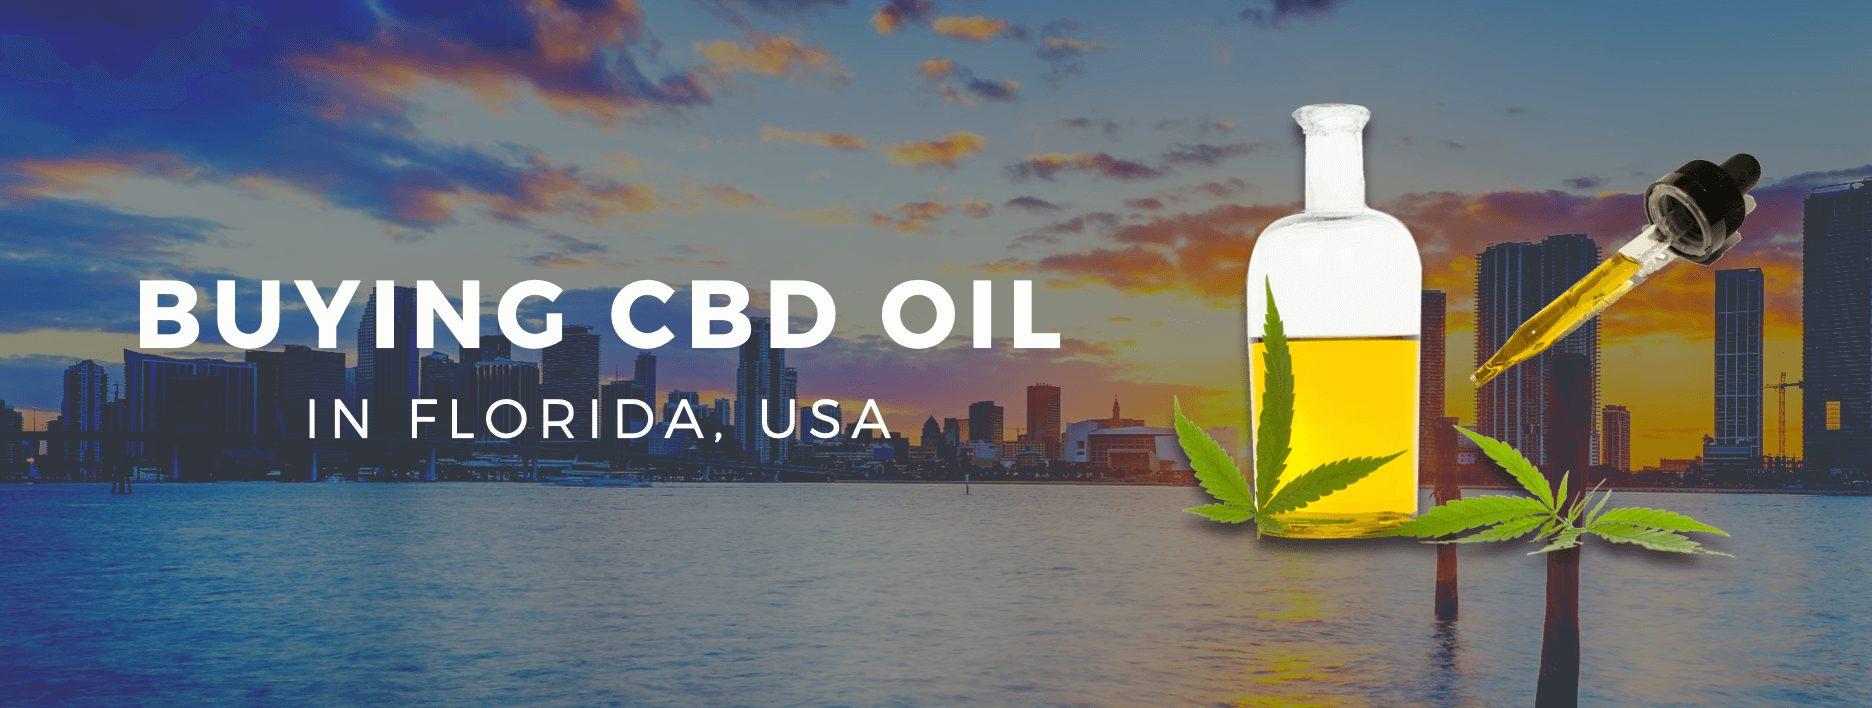 CBD oil Florida